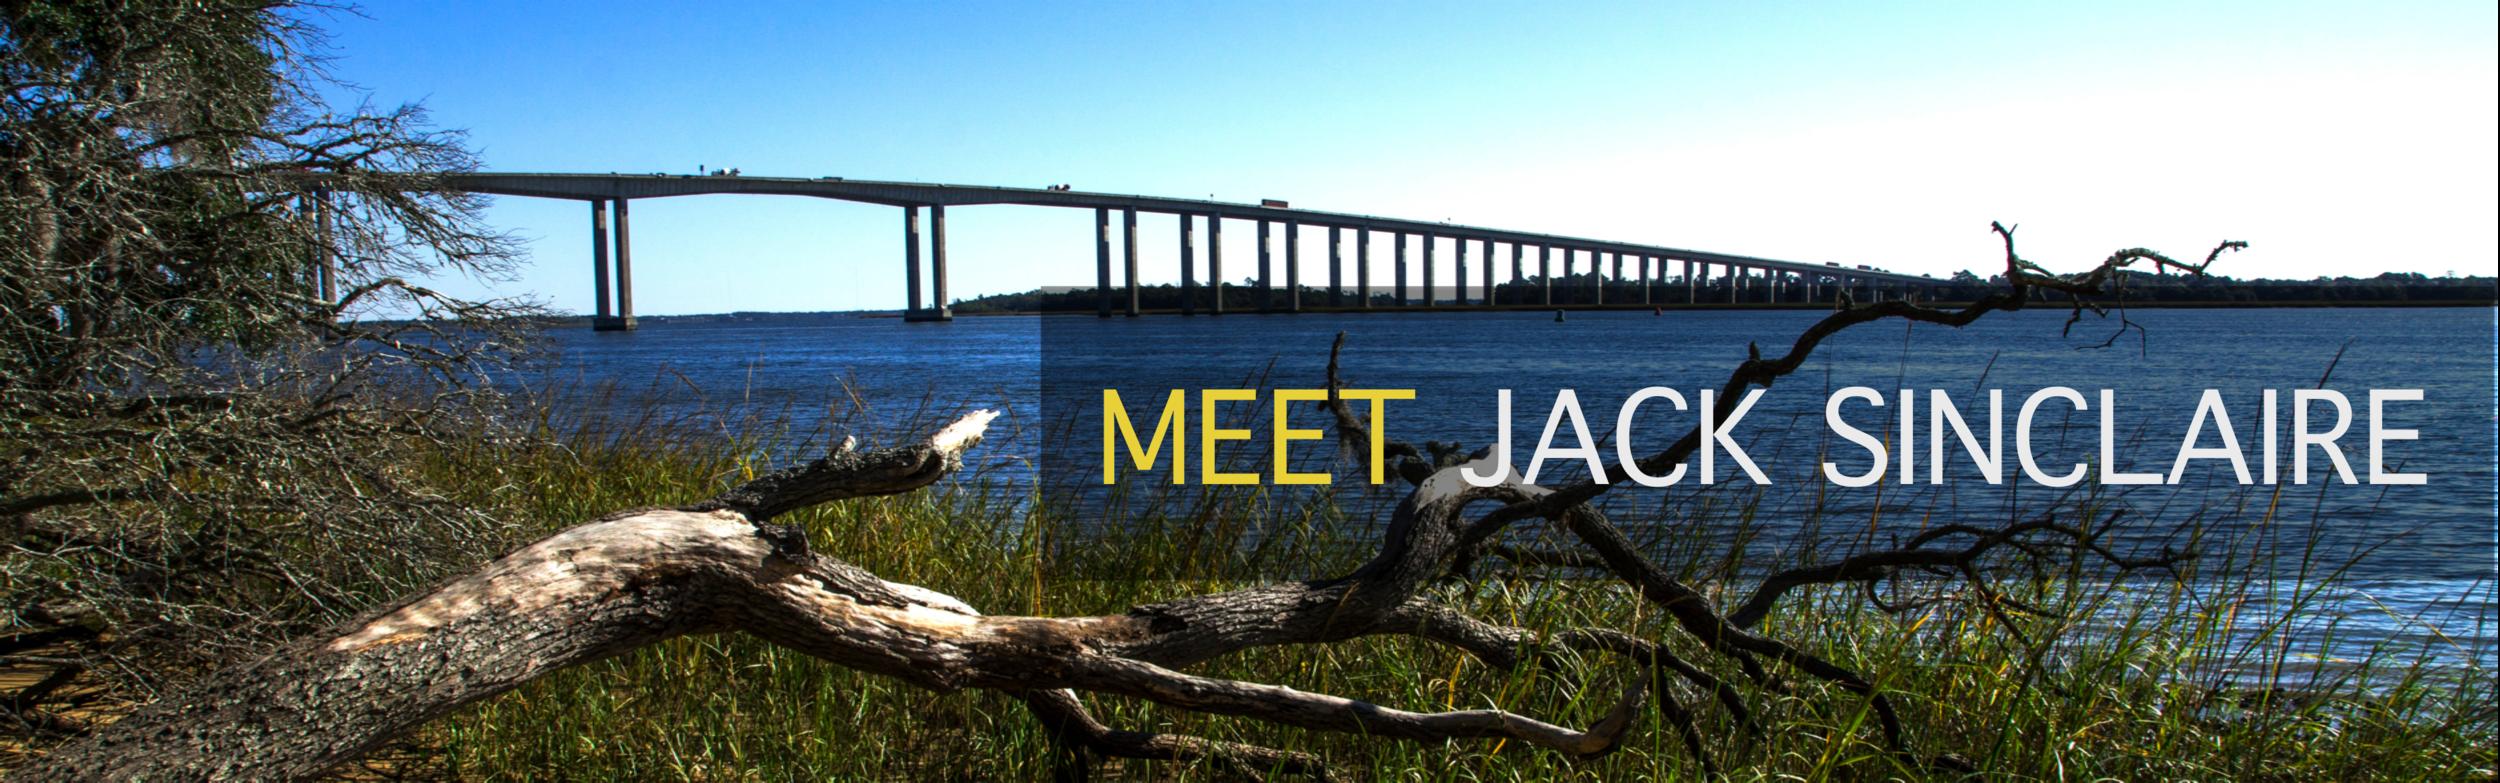 Meet Jack Sinclair v2.png